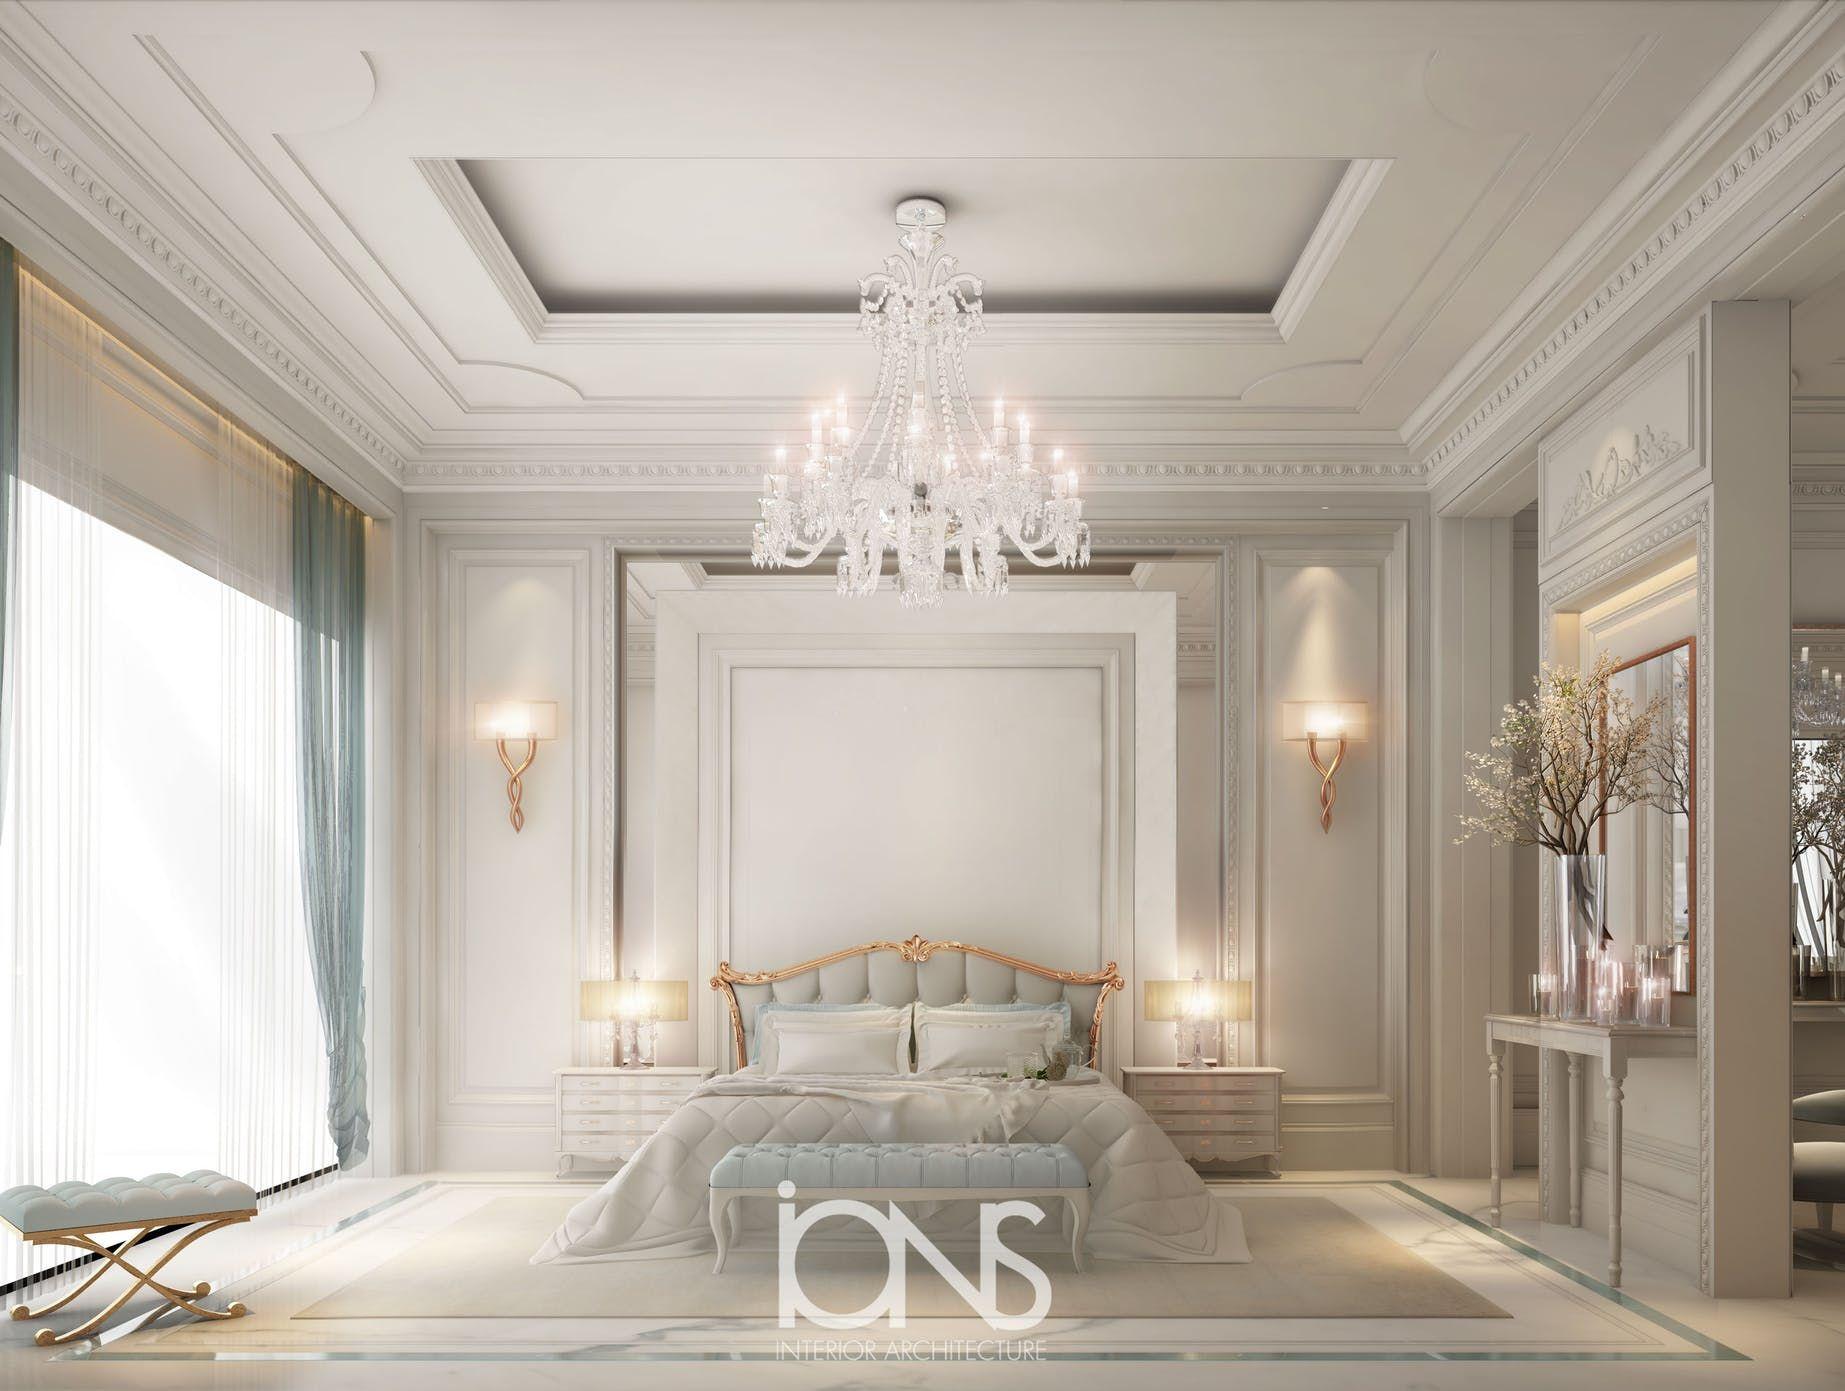 Elegant Neo Classic Master Bedroom Design Luxurious Bedrooms